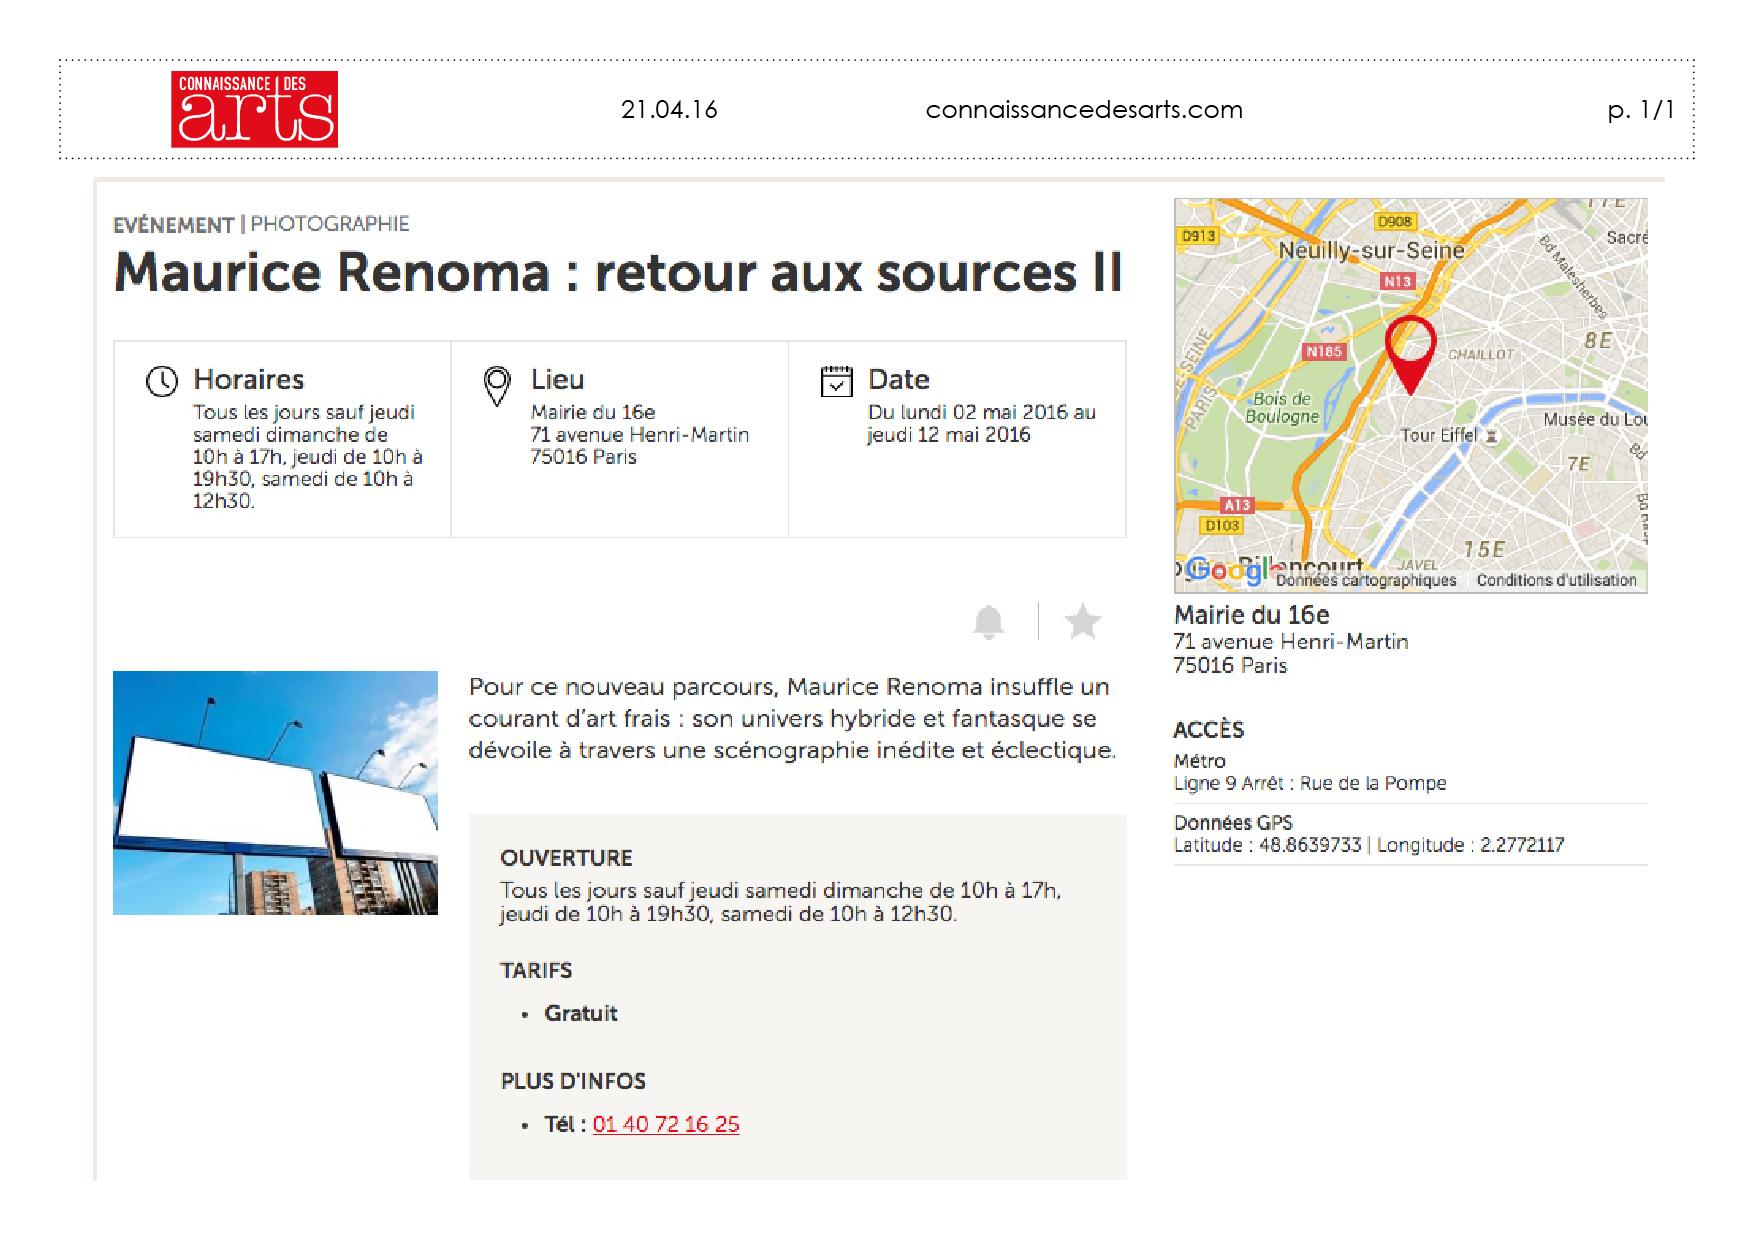 PRESSE_BOOK_RETOURAUXSOURCESII12